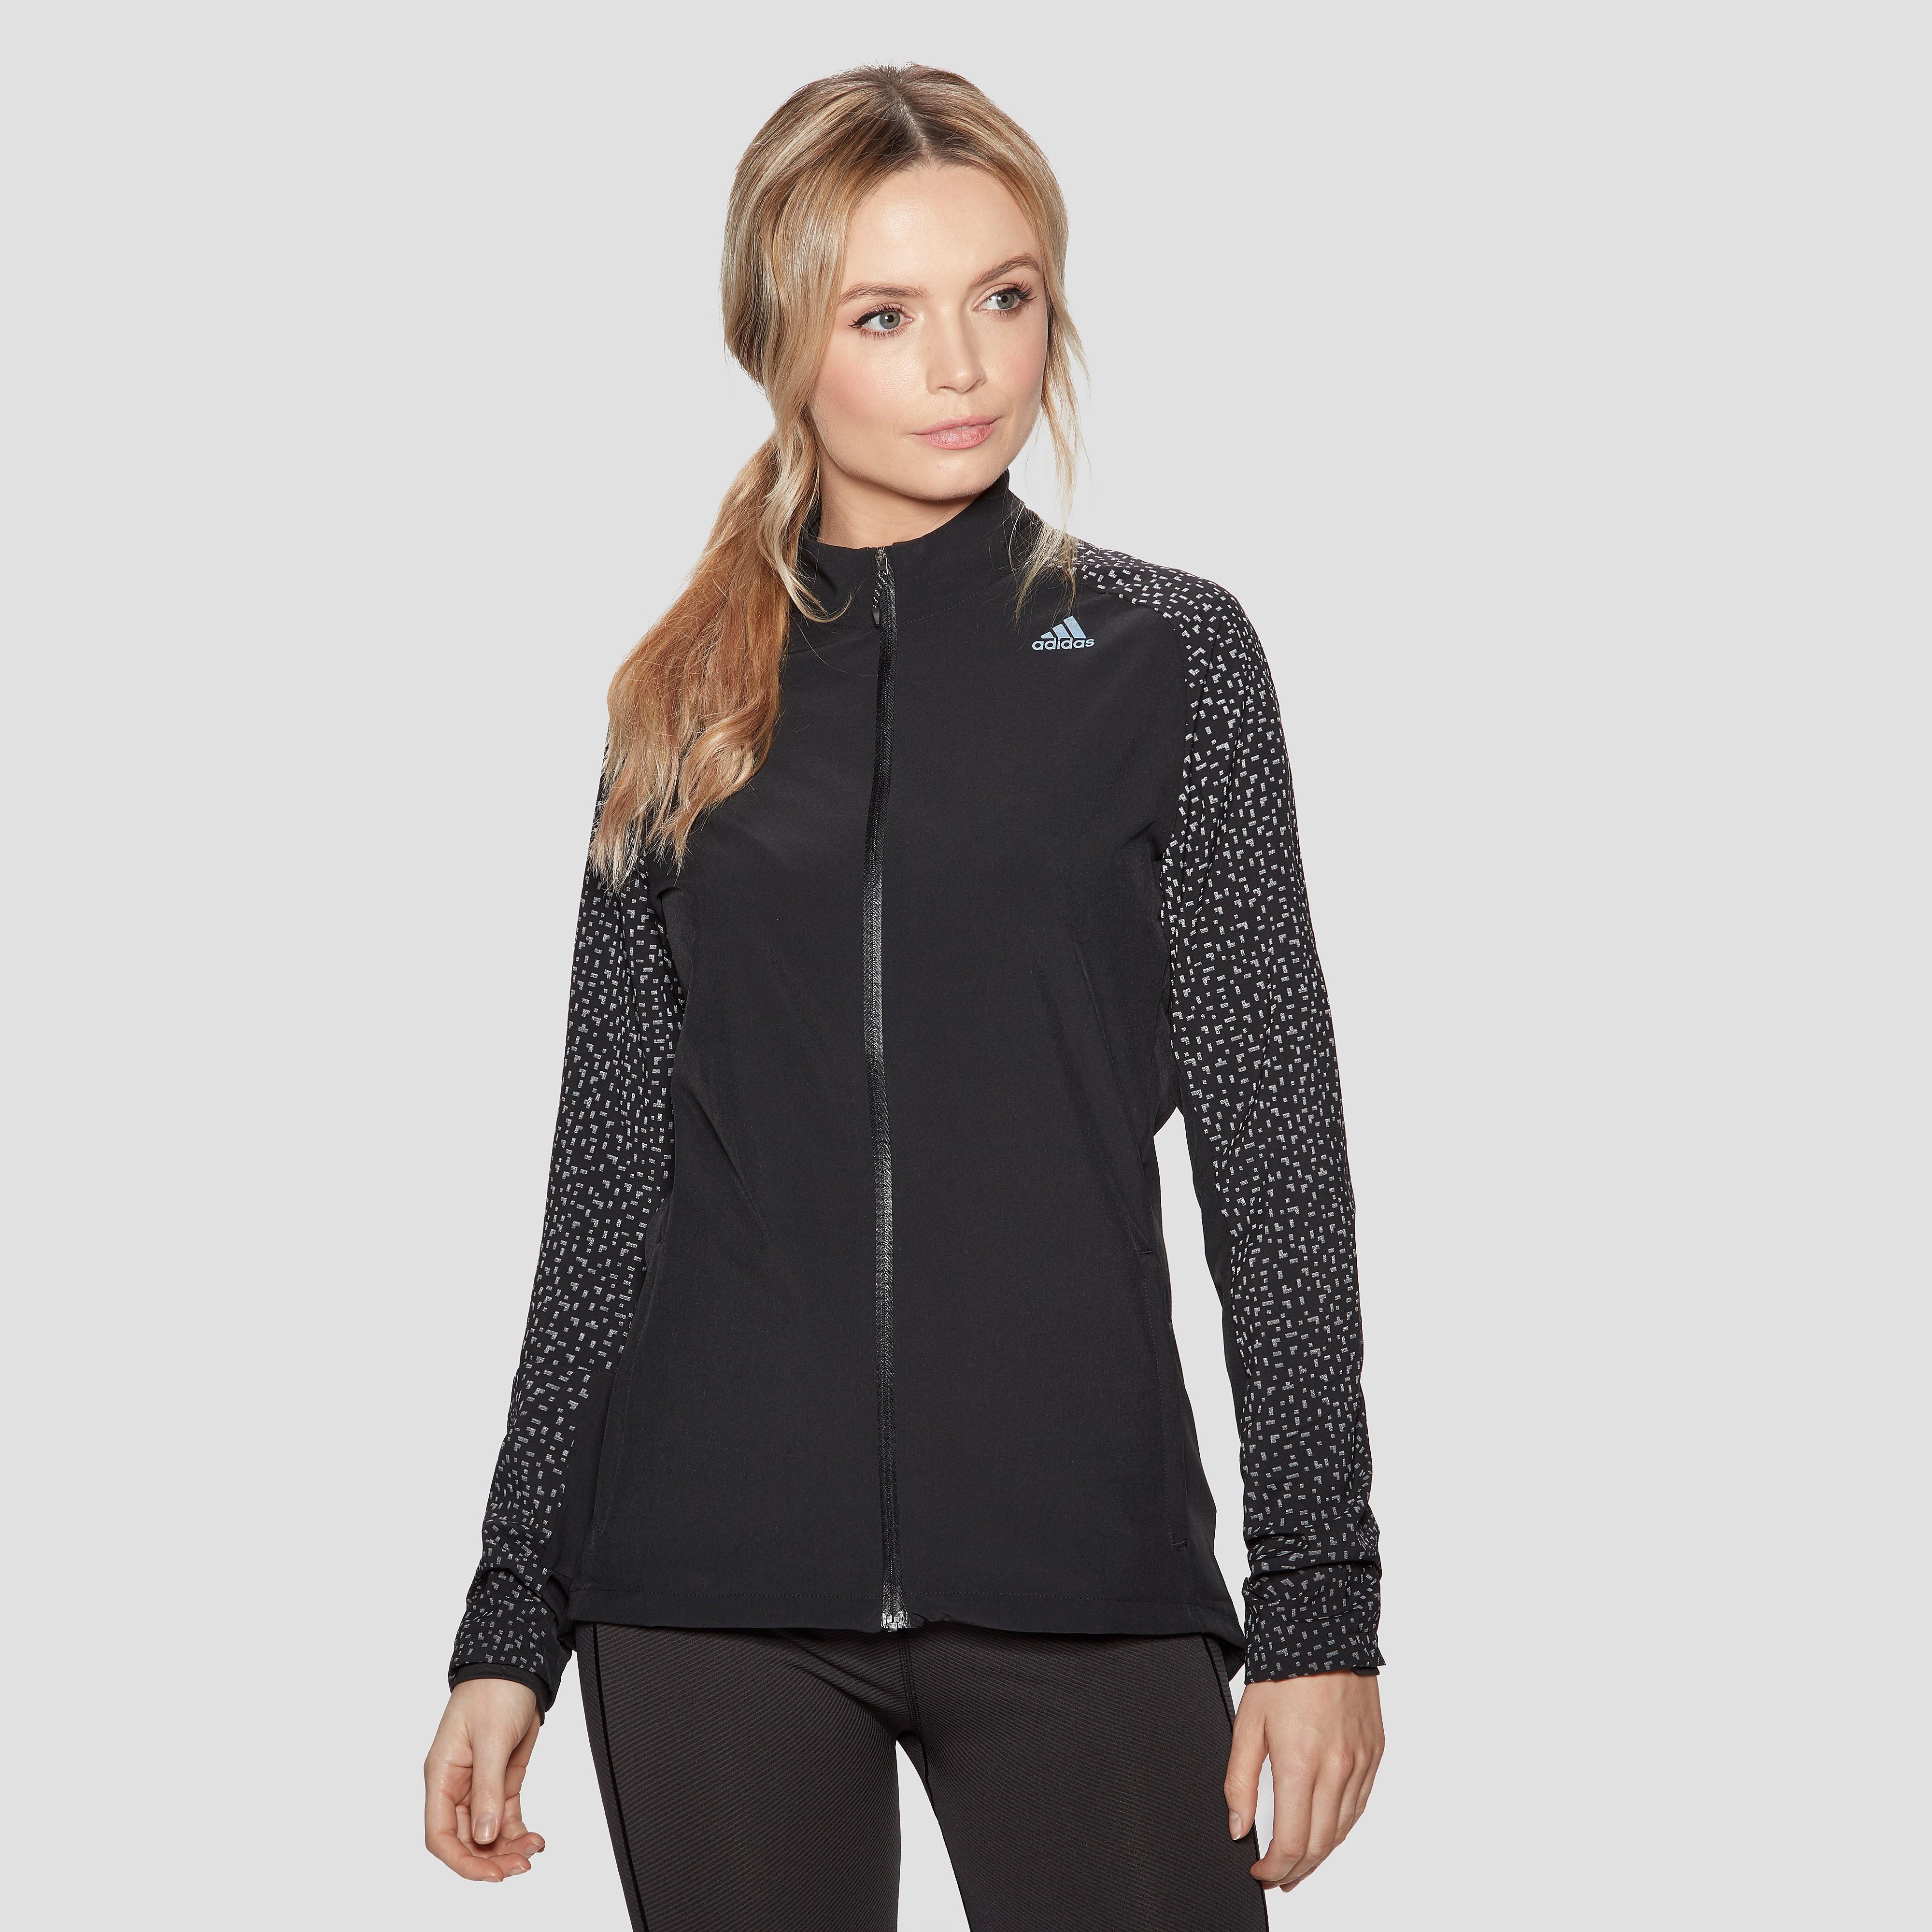 adidas Supernova Storm Women's Running Jacket